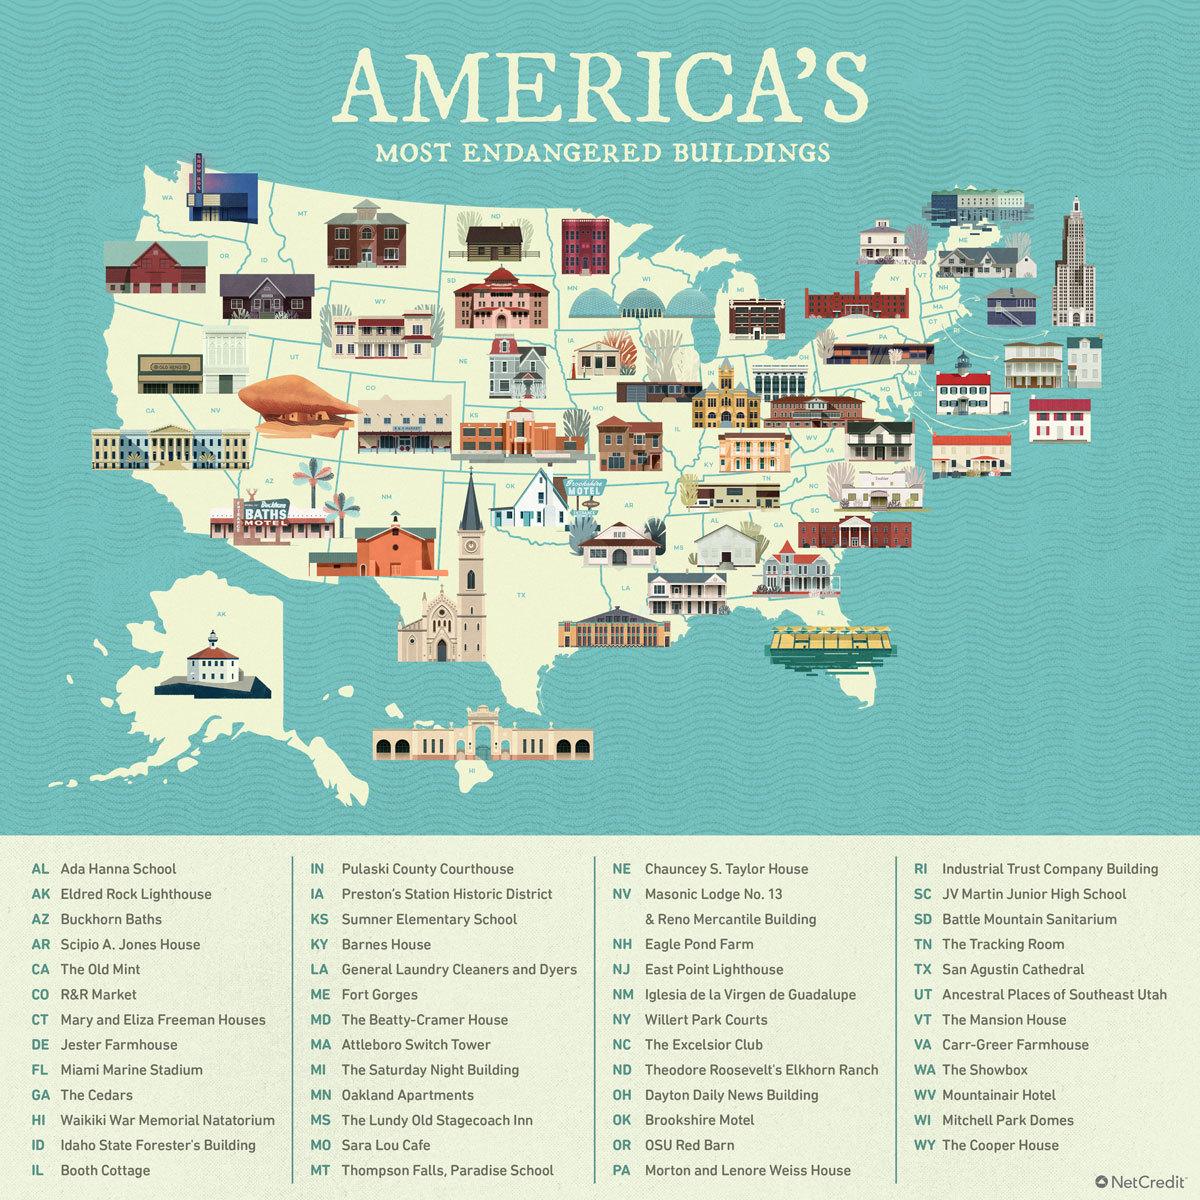 America's Most Endangered Buildings